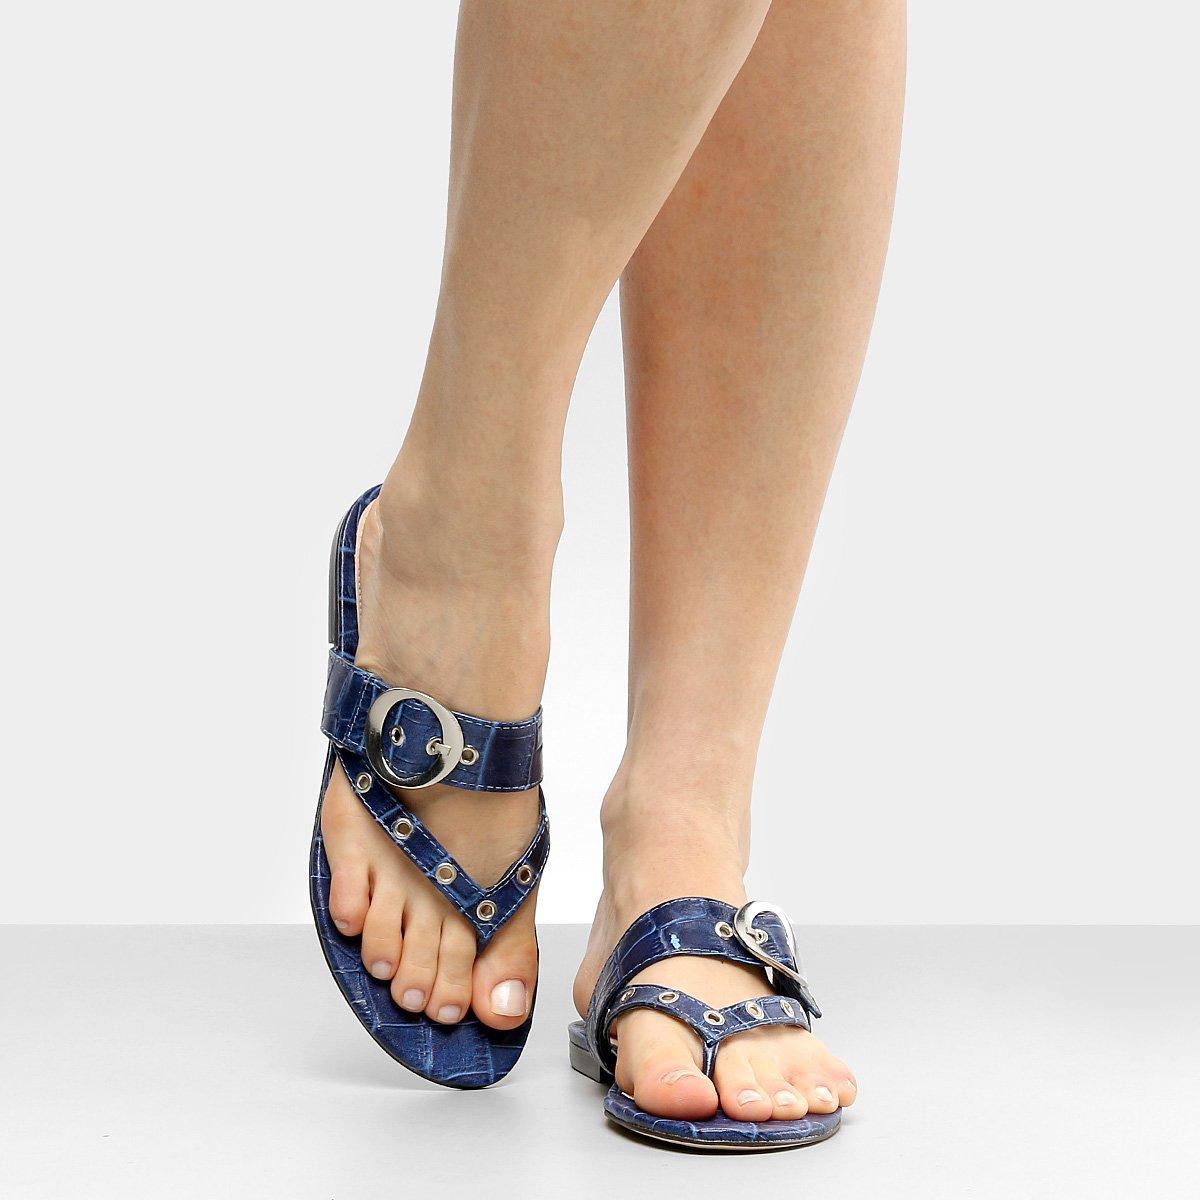 Azul Shoestock Shoestock Croco Couro Rasteira Fivela Croco Fivela Rasteira Couro HzwqdH